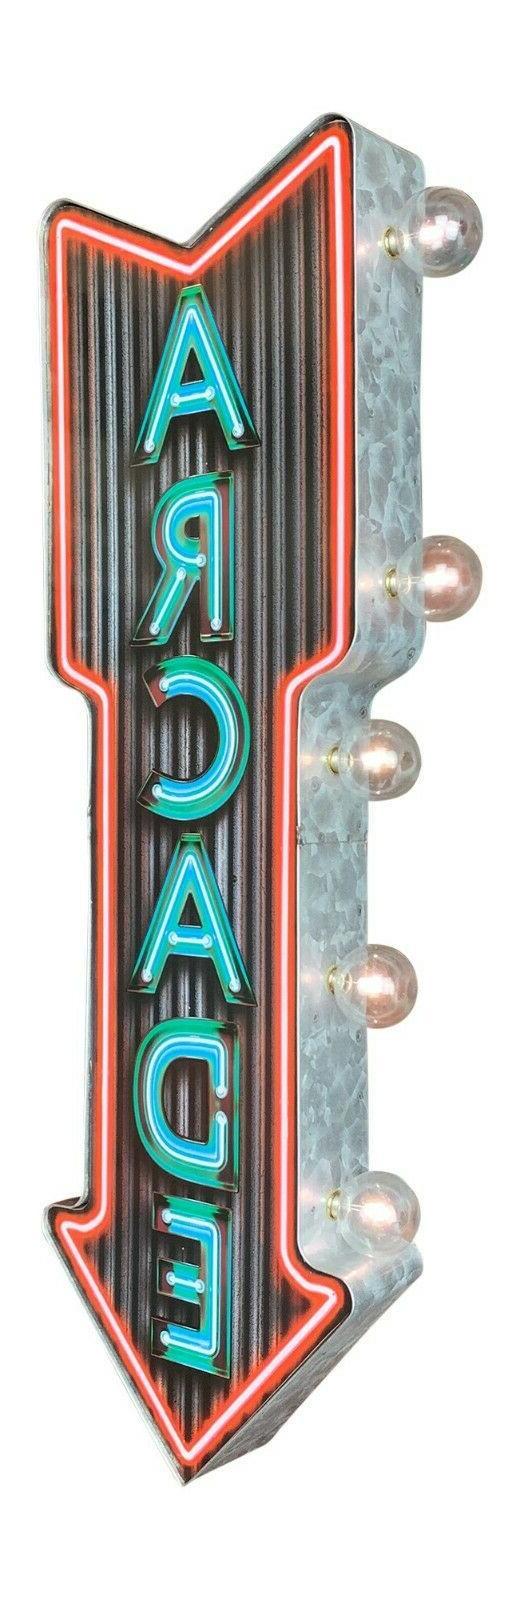 "Neon Arcade LED Sign, 25"" Double Sided Arrow Shaped, Man Cav"